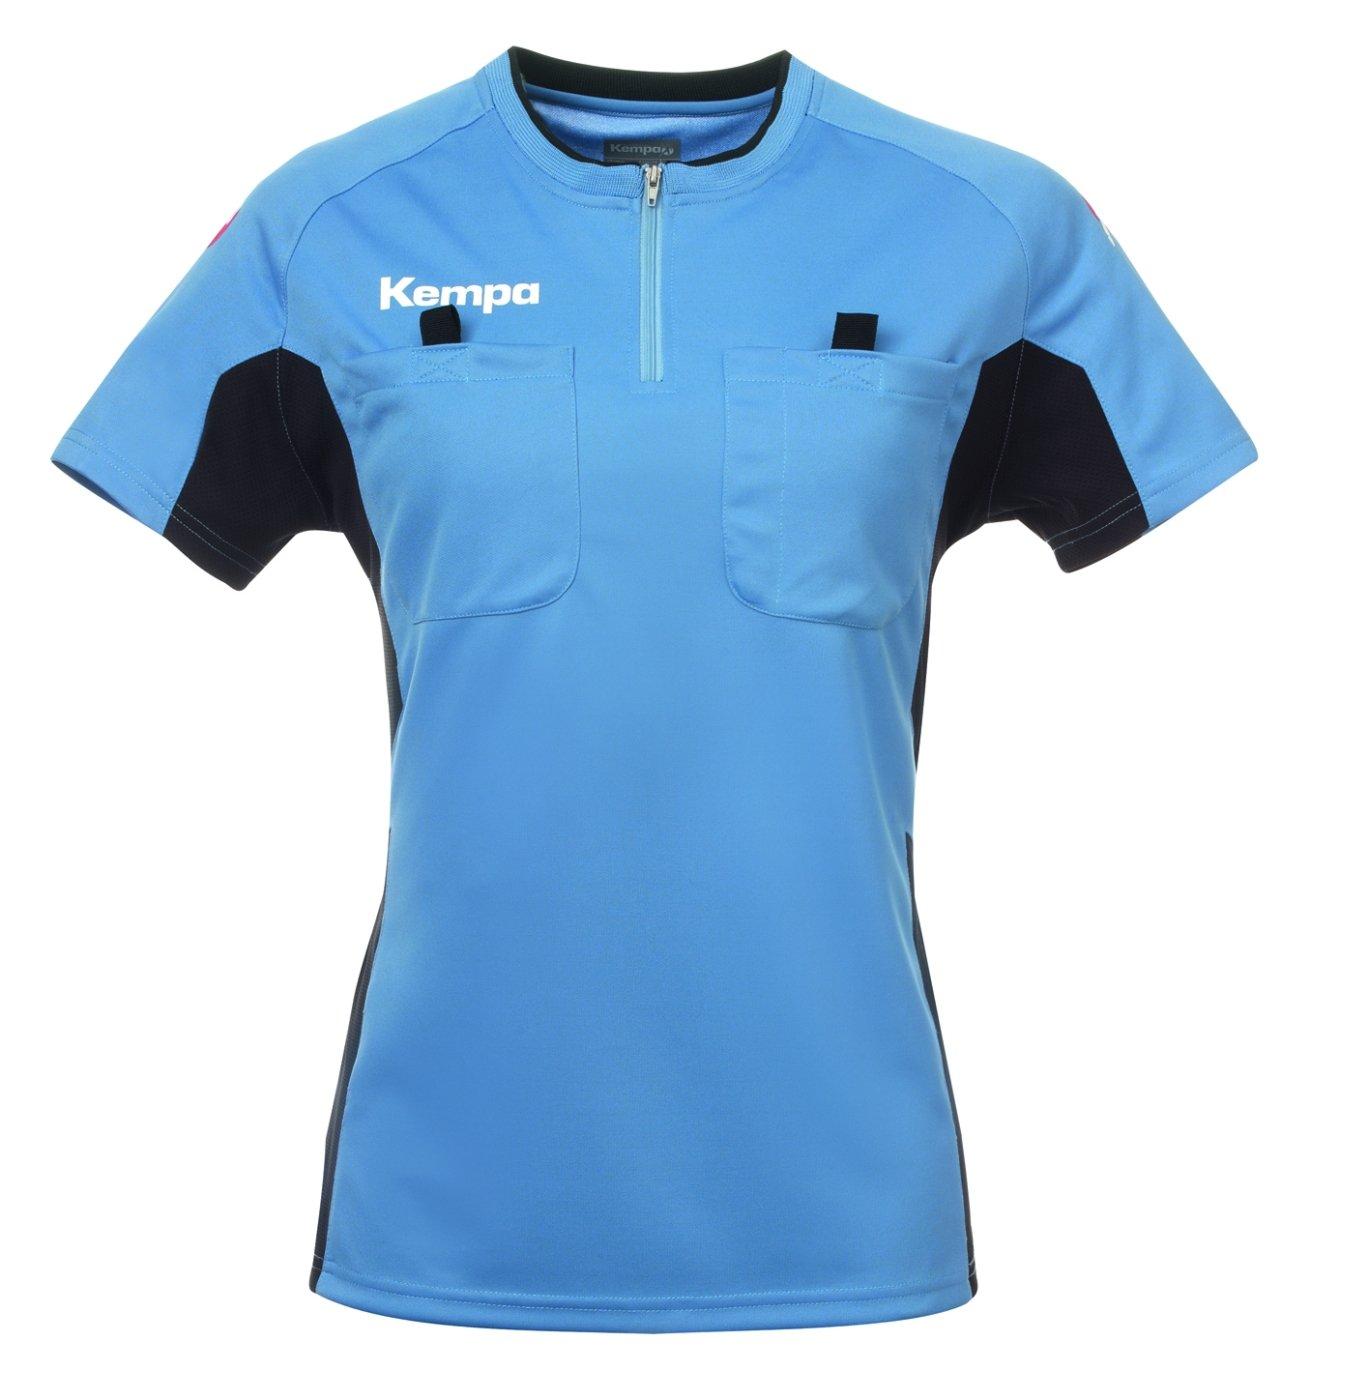 Kempa Referee Shirt Women fair Blue/Black